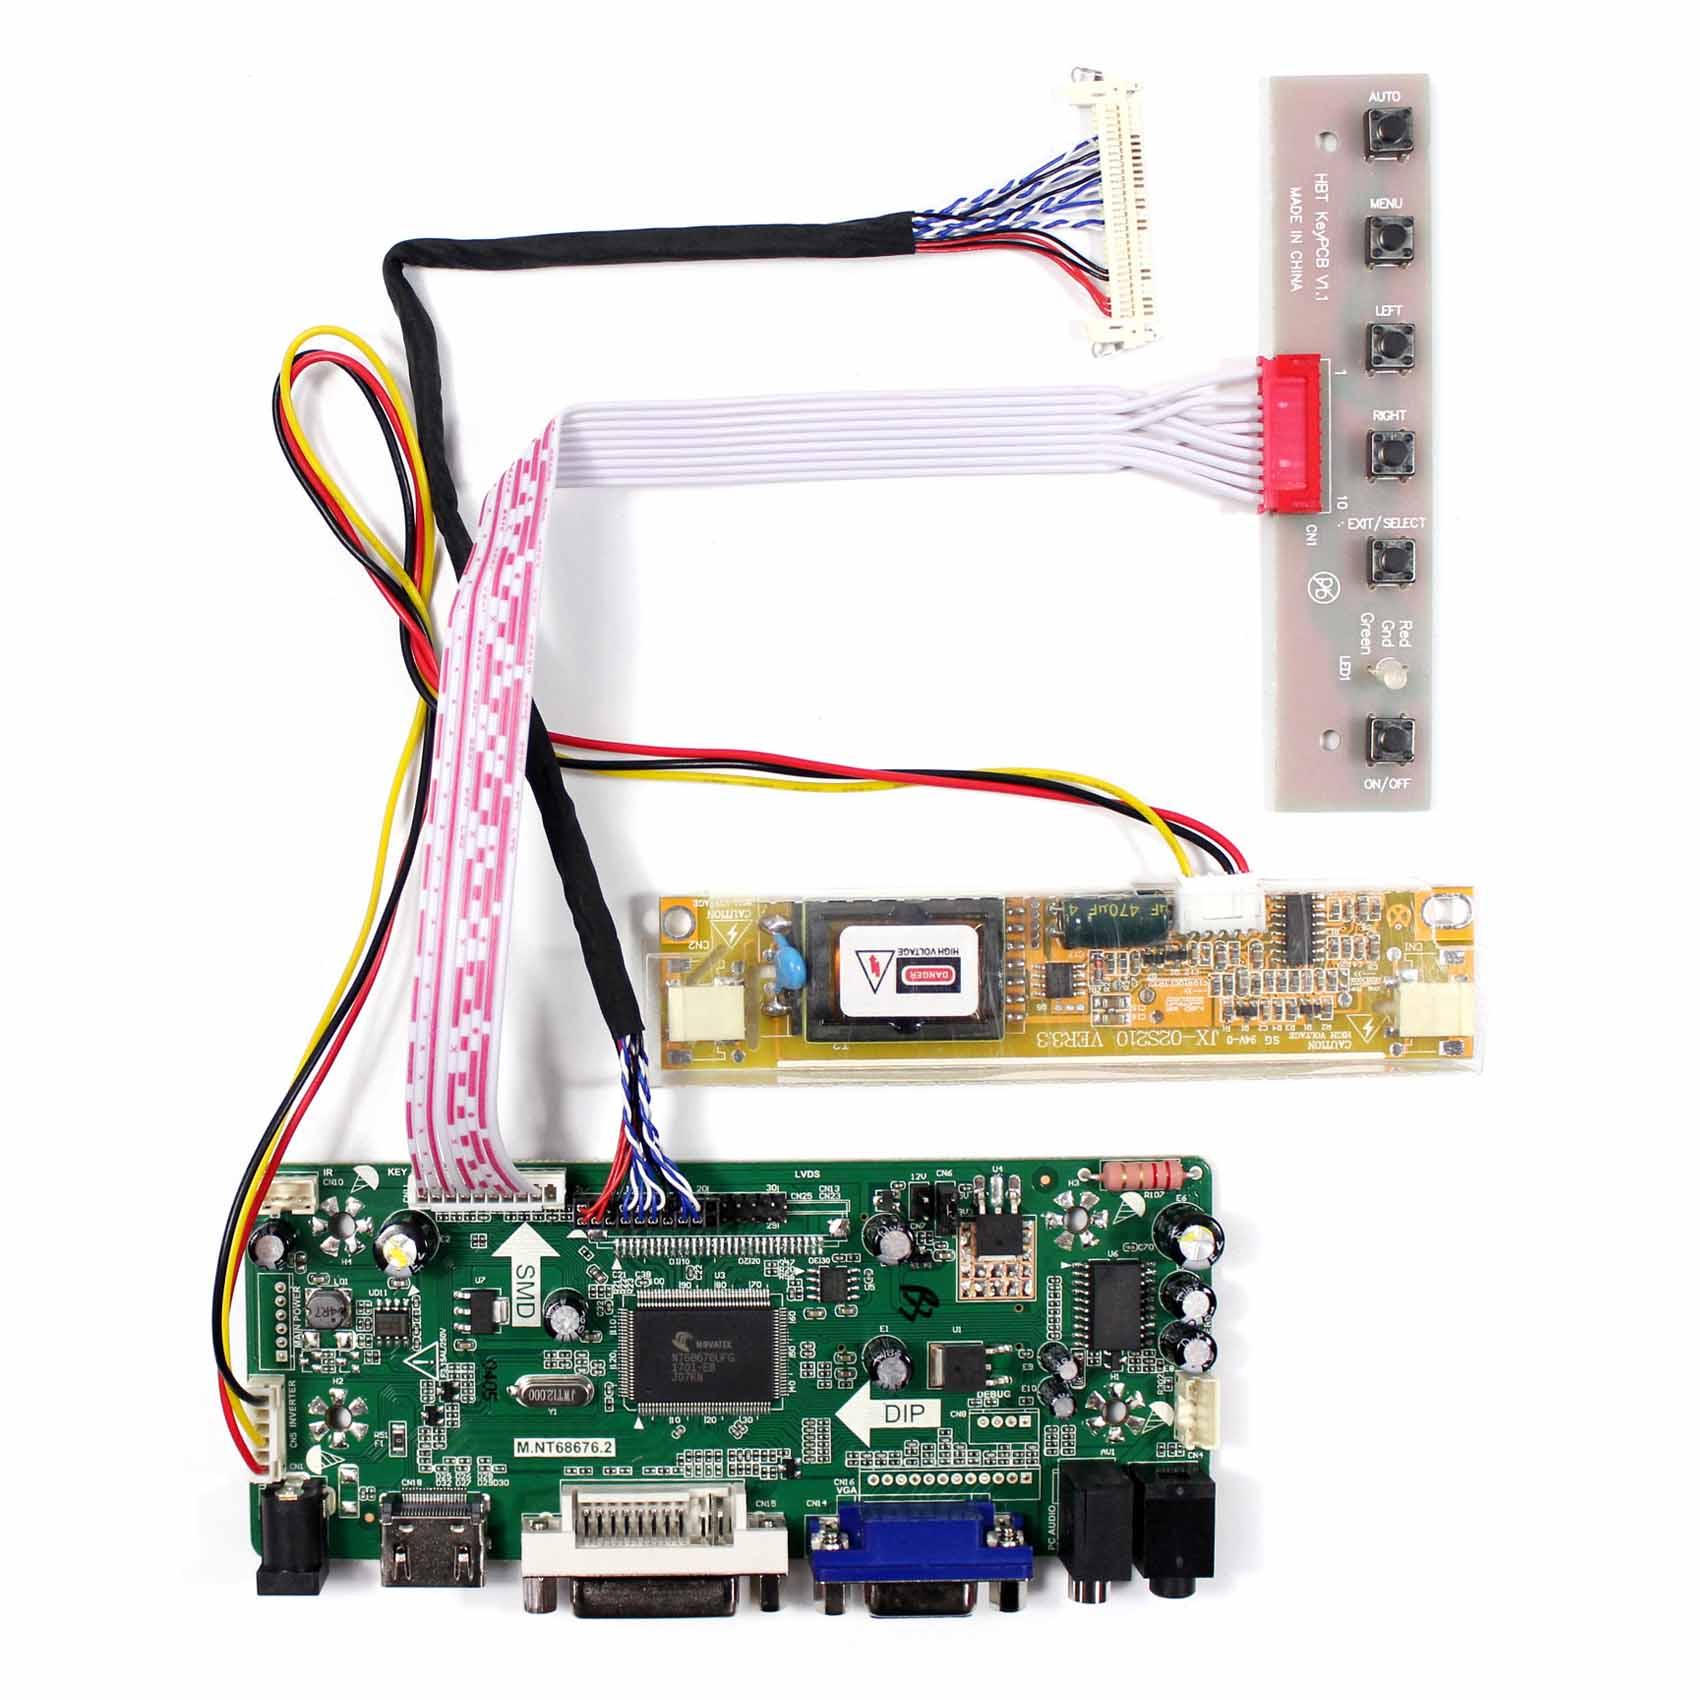 HDMI VGA DVI Placa de controlador de audio LCD de 18,5 pulgadas 1366x768 M185XW01 V0 M185XW01 V2 M185XW01 V4 etc. 2CCFL 30pin LCD panel